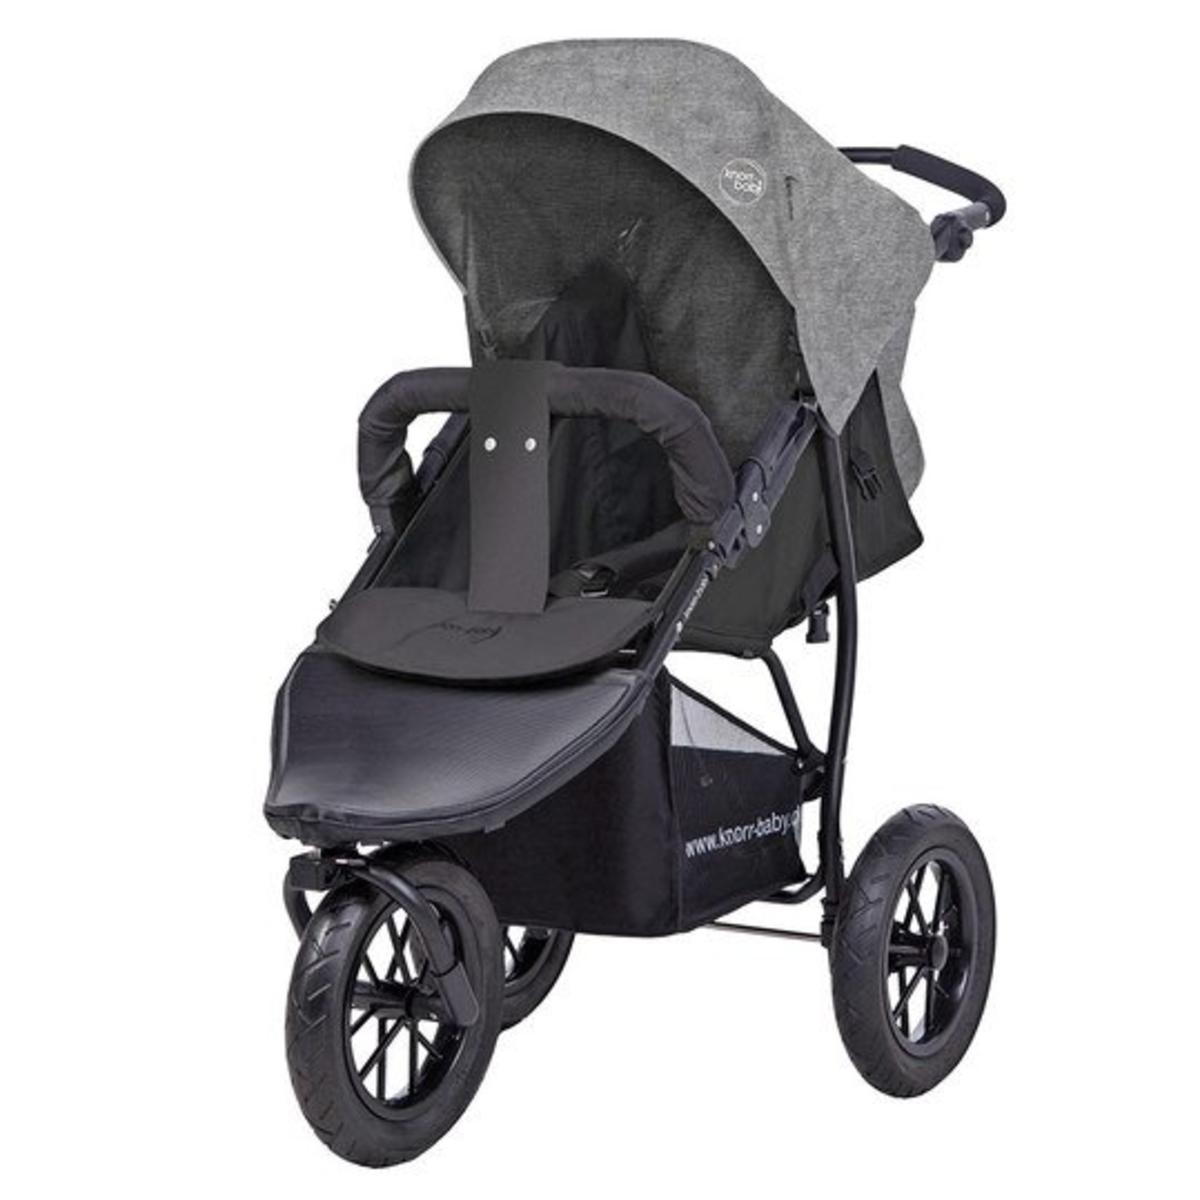 knorr baby joggy s dreirad kinderwagen buggy grau gebraucht stext ebay. Black Bedroom Furniture Sets. Home Design Ideas